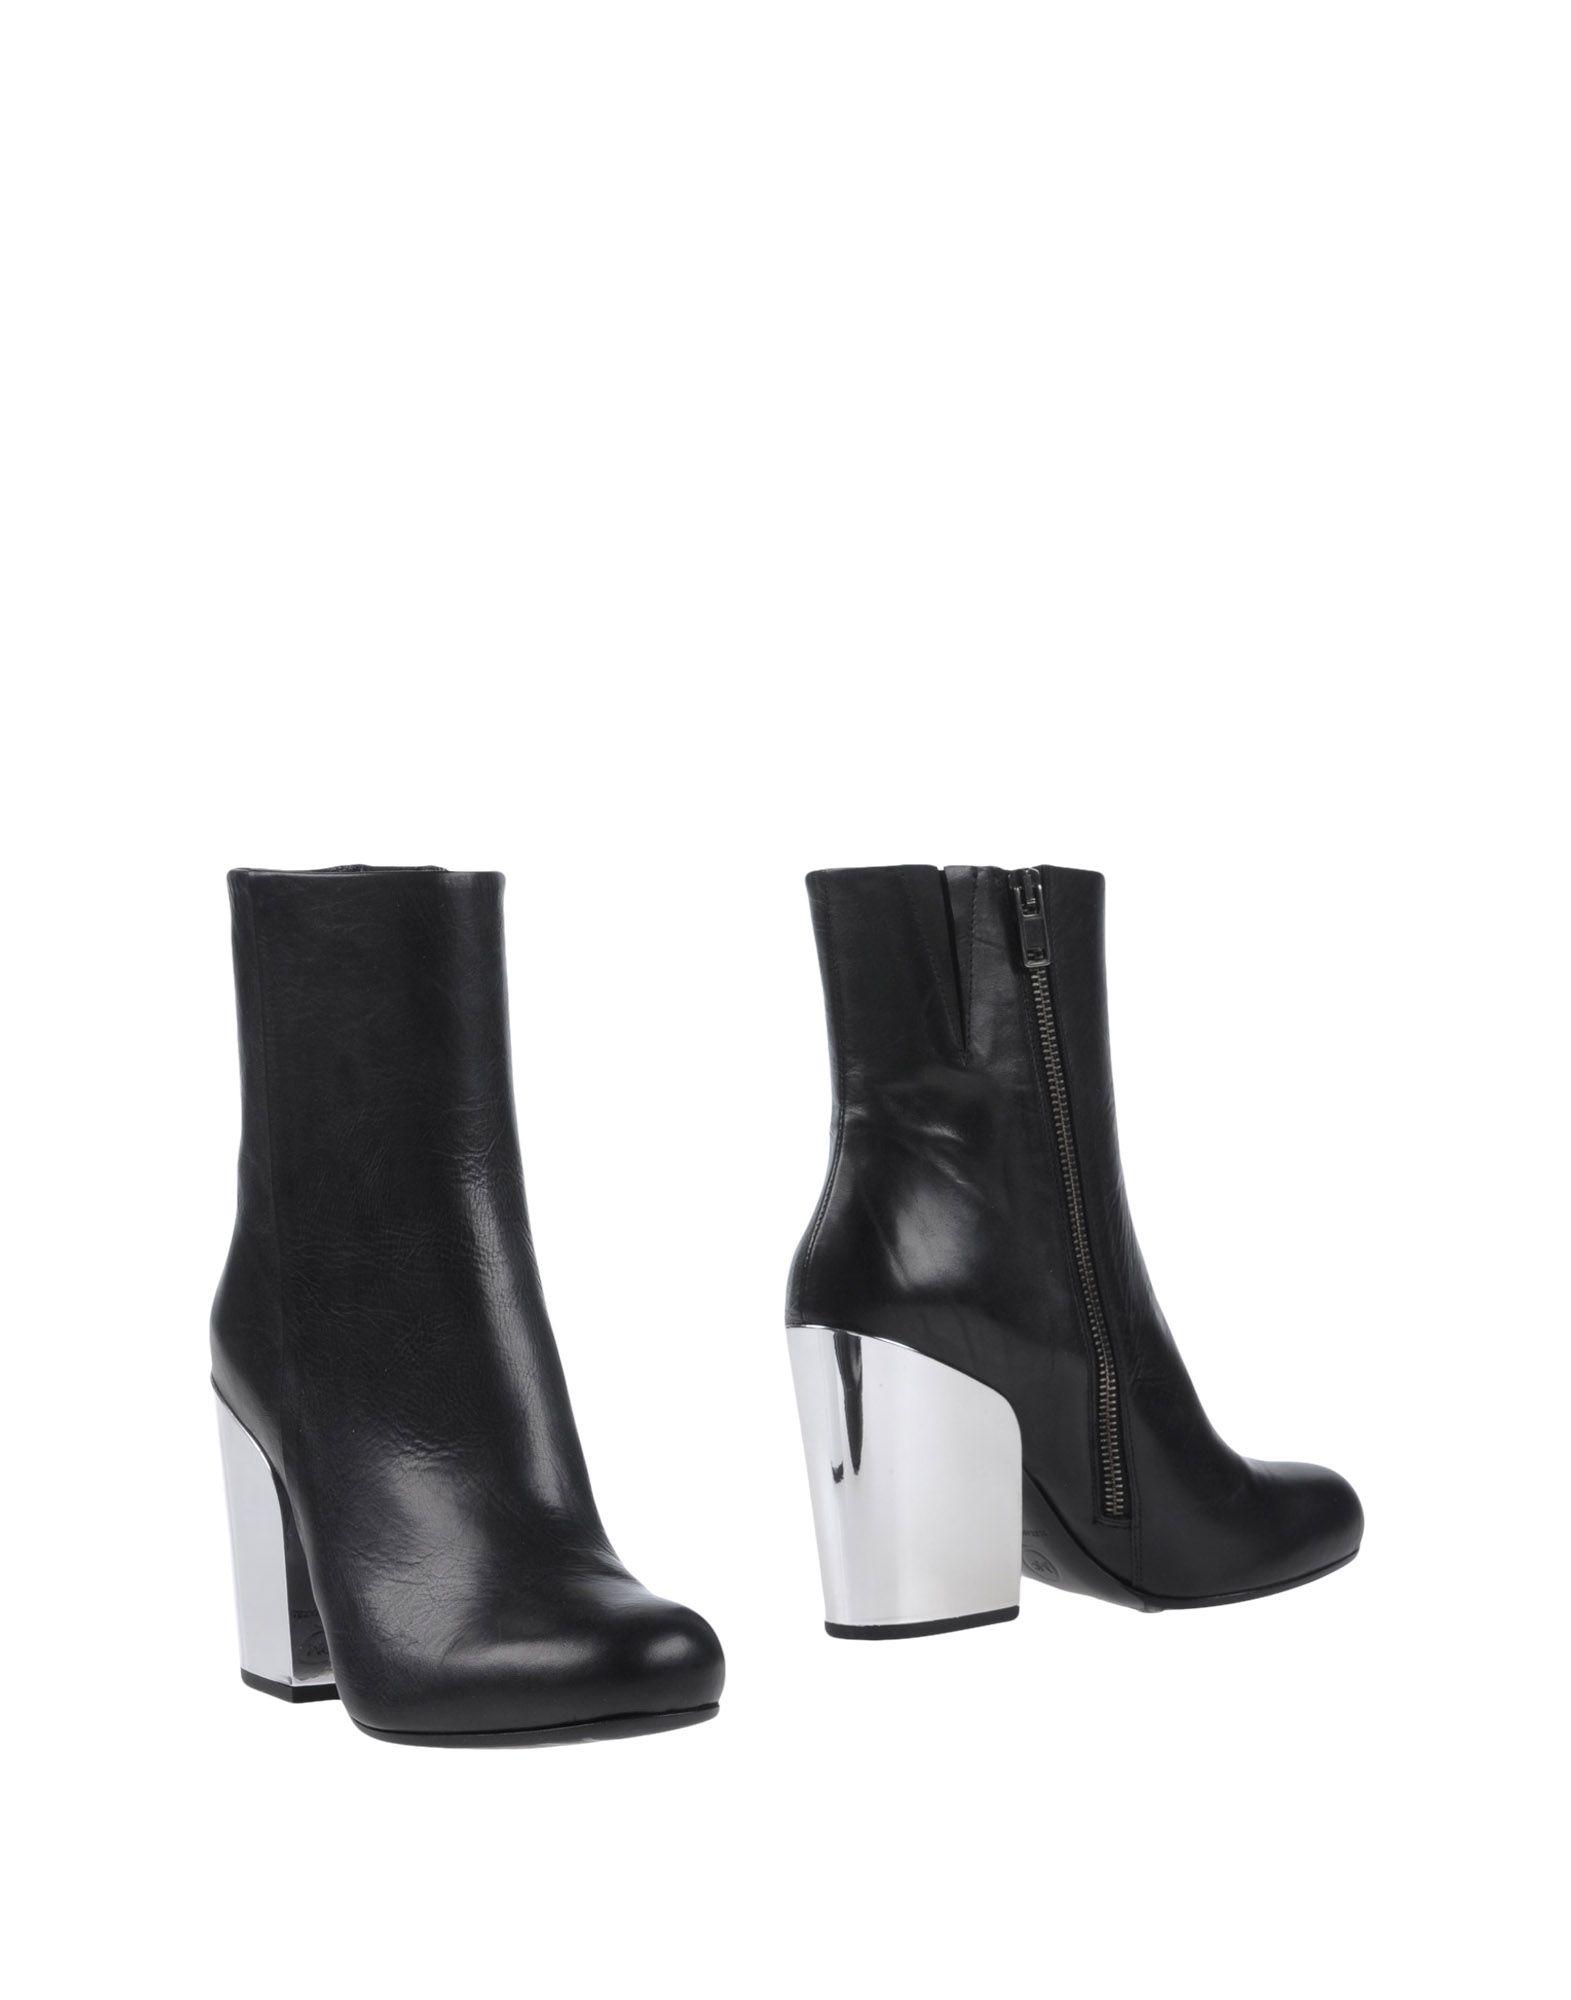 Rabatt Schuhe Mcq Alexander Mcqueen Stiefelette Damen  11120133UU